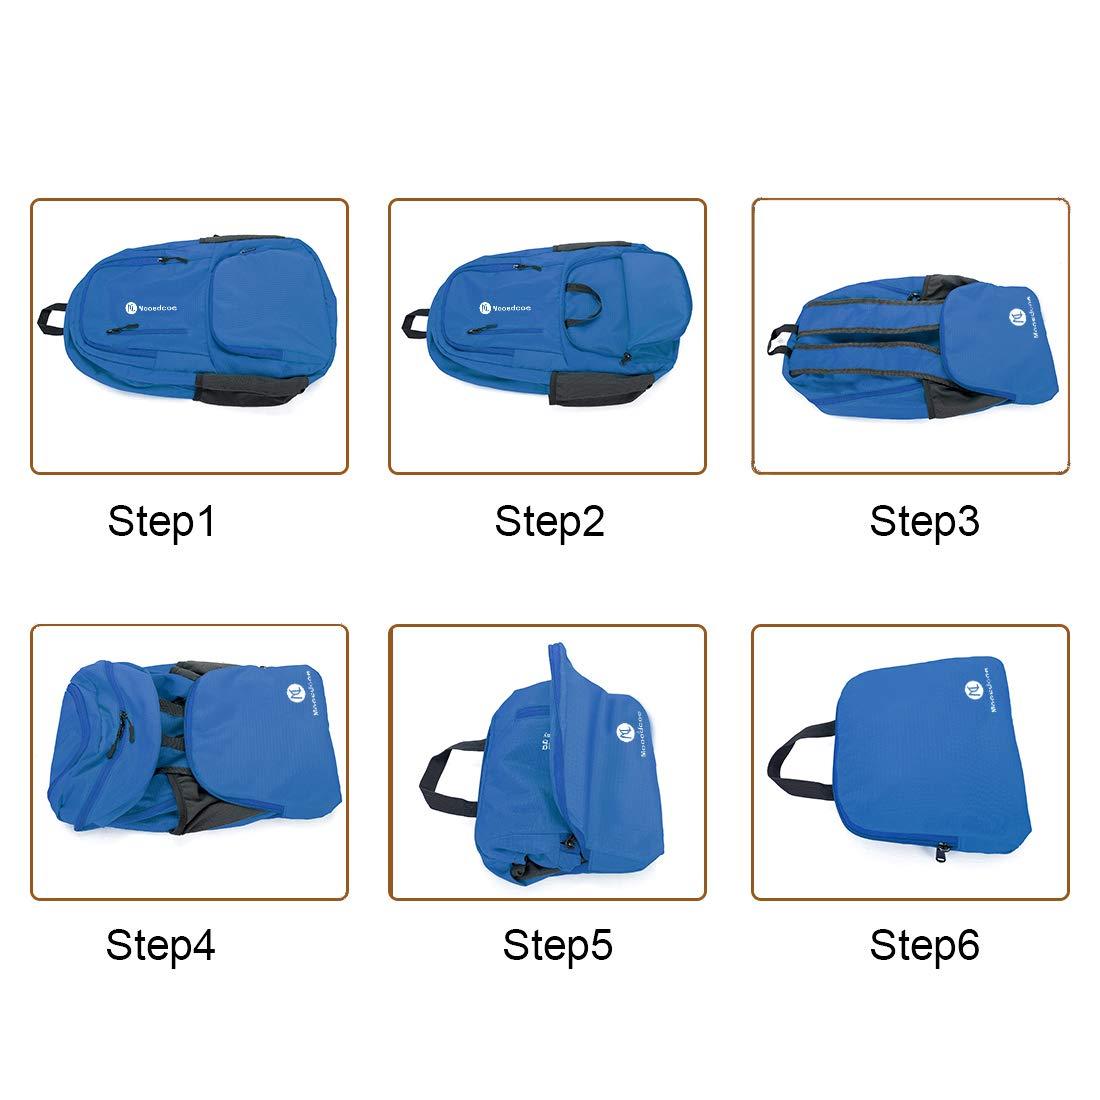 Mooedcoe Ultra Lightweight Packable Backpack Water Resistant Hiking Daypack Handy Foldable Camping Outdoor Backpacks Little Bag Orange